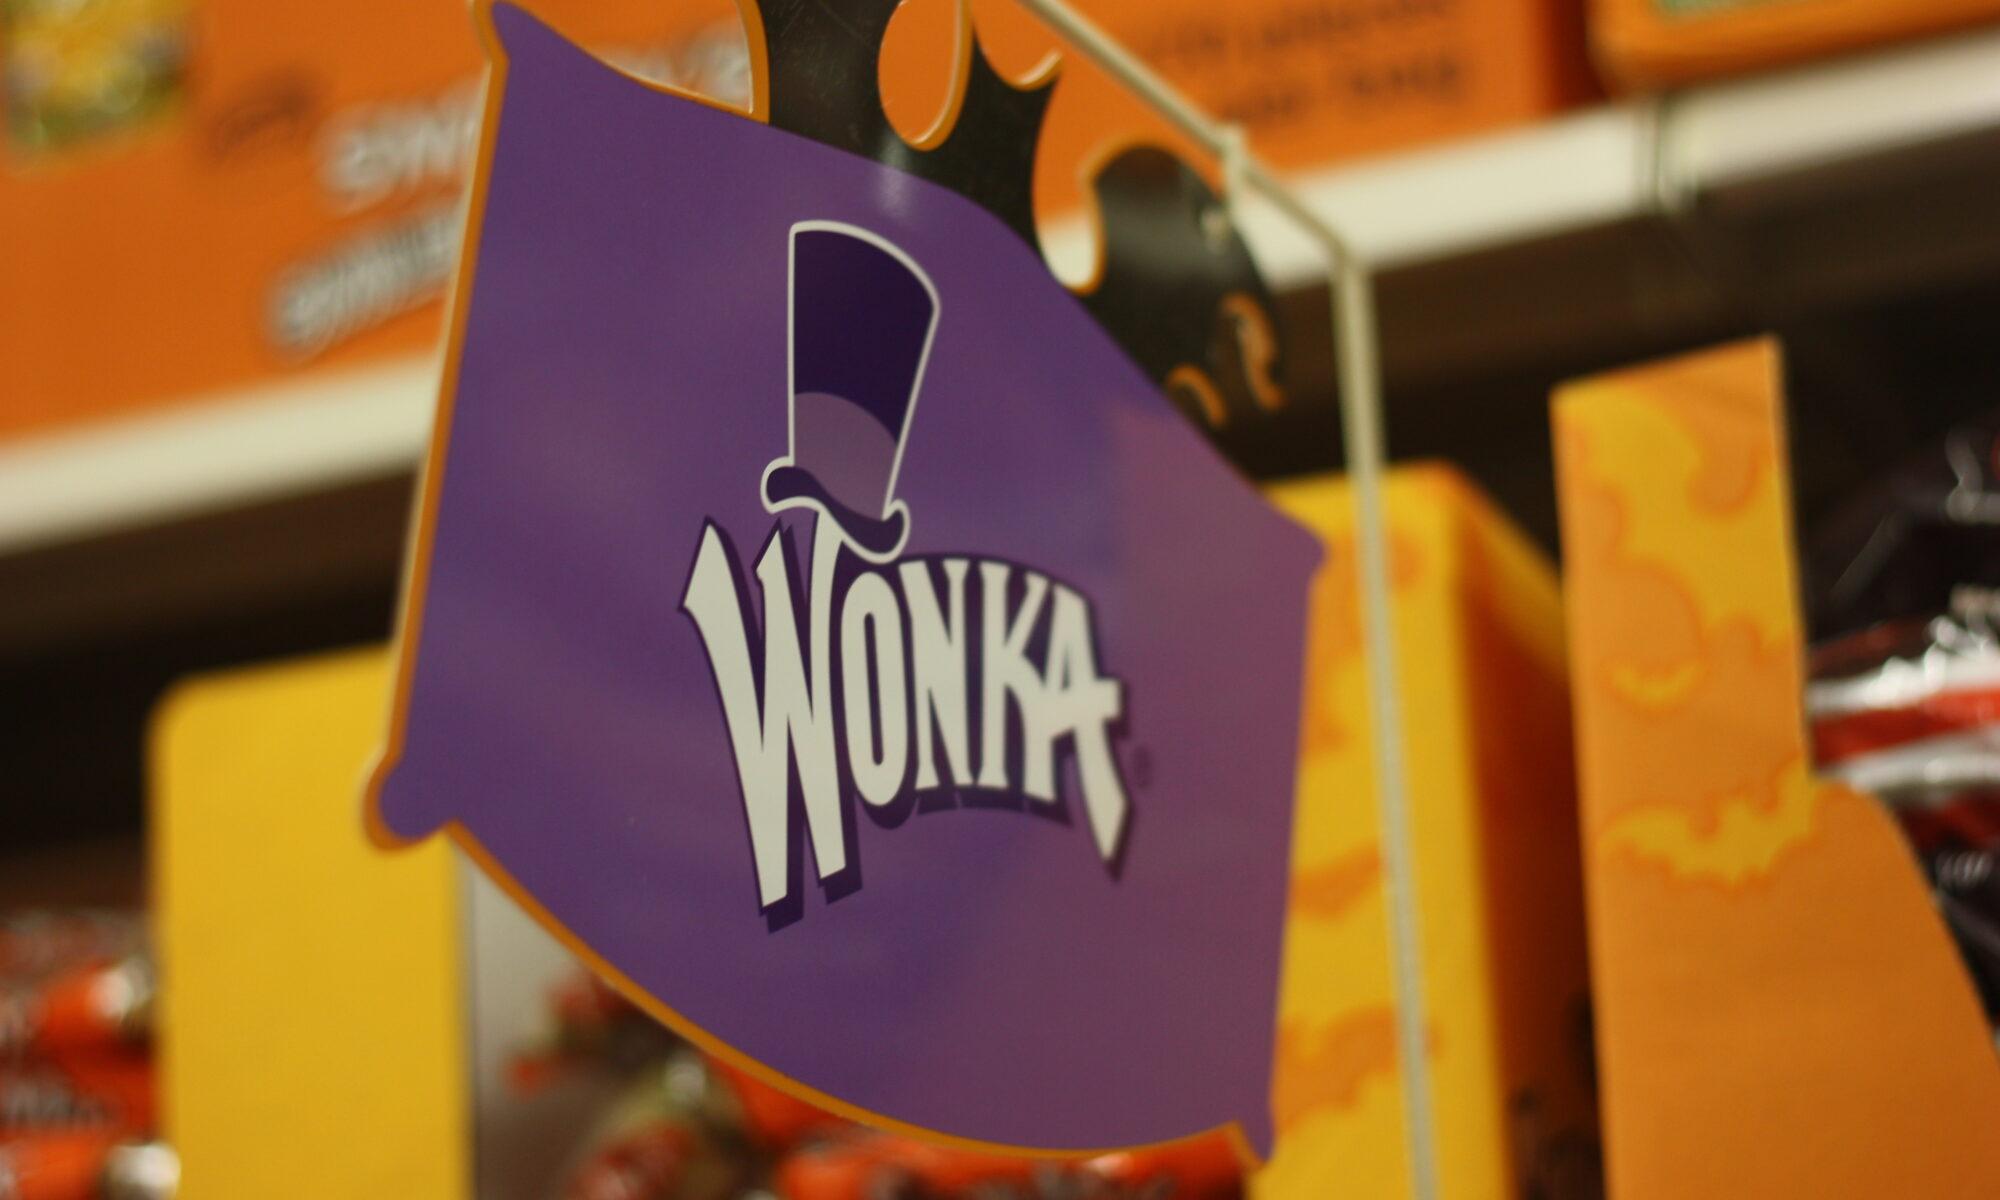 Wonka Post